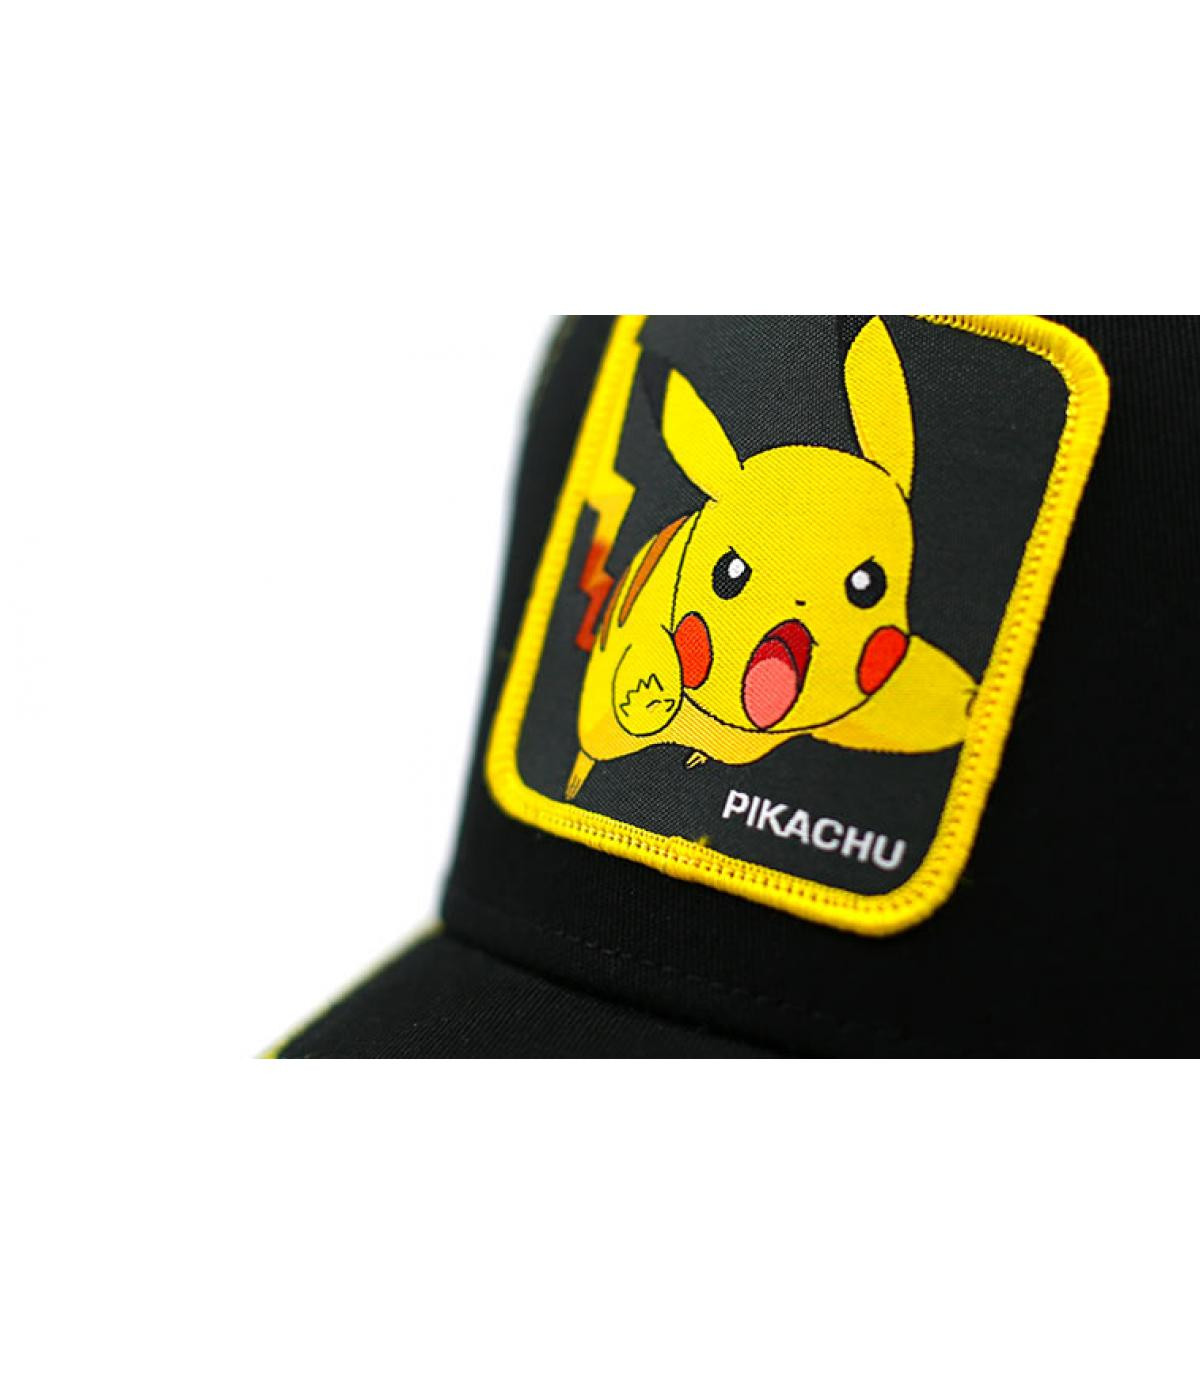 Details Trucker Pokelon Pikachu - afbeeling 3